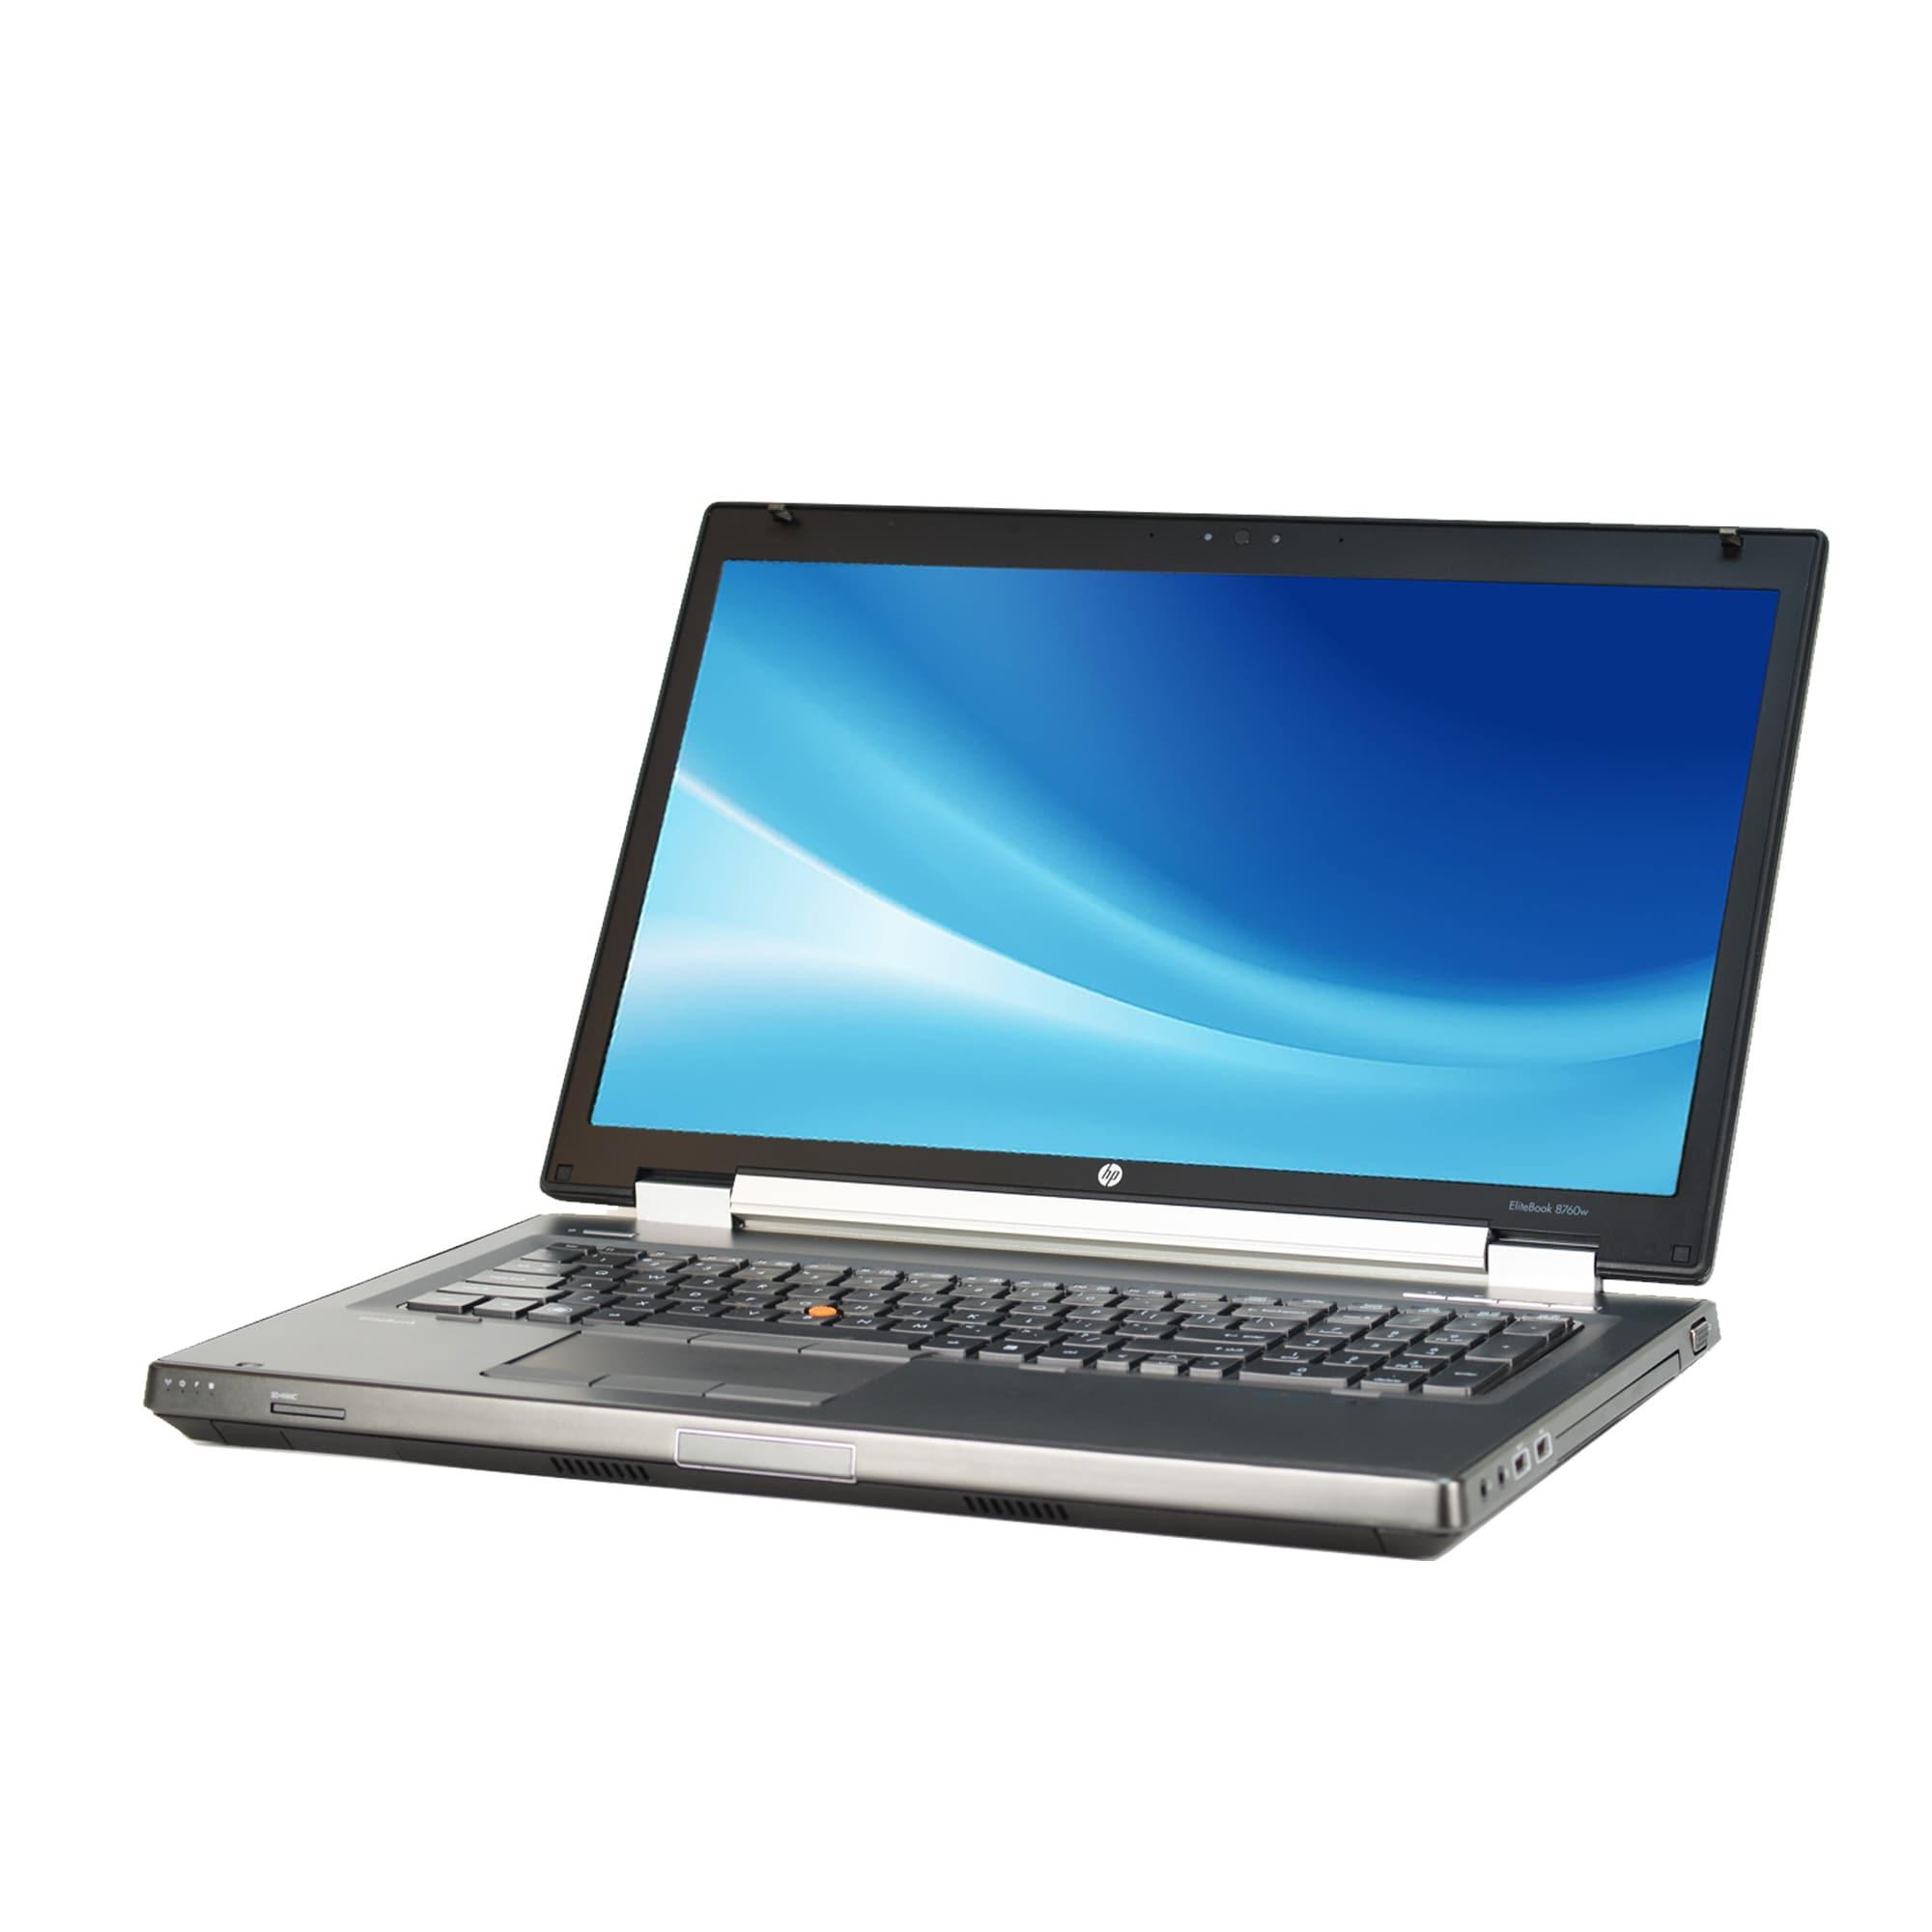 Shop HP Elitebook 8760W Intel Core i7-2720QM 2.2GHz 2nd Gen CPU 8GB RAM  500GB HDD Windows 10 Pro 17.3-inch Laptop (Refurbished) - Free Shipping  Today ...